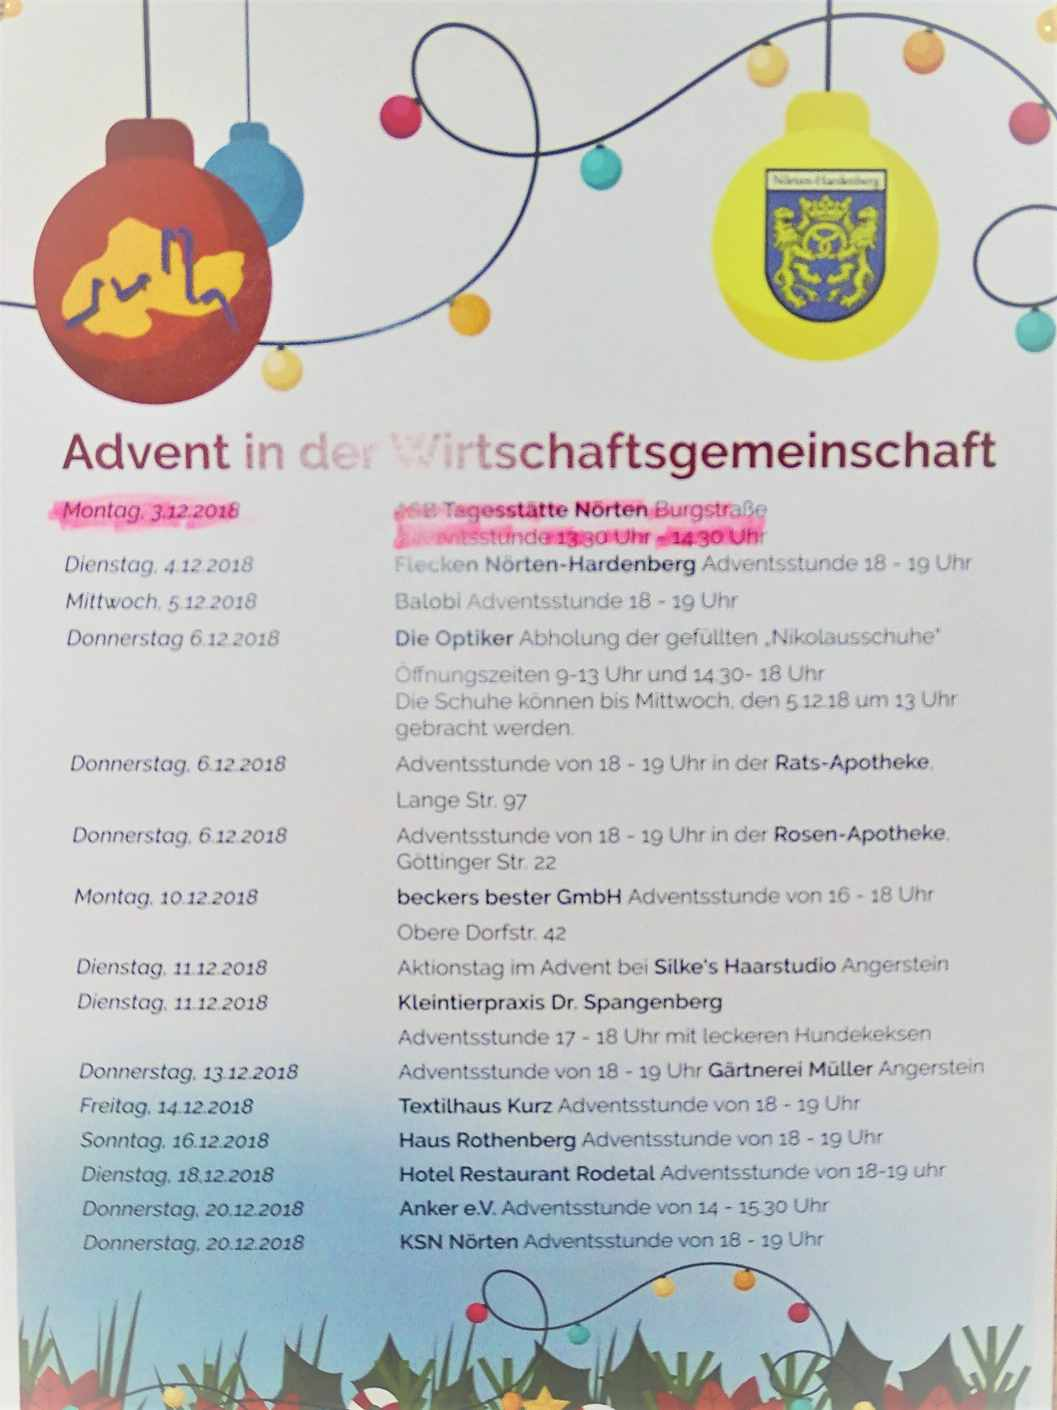 Lebendiger Adventskalender TPE Nörten 2018 (4).JPG